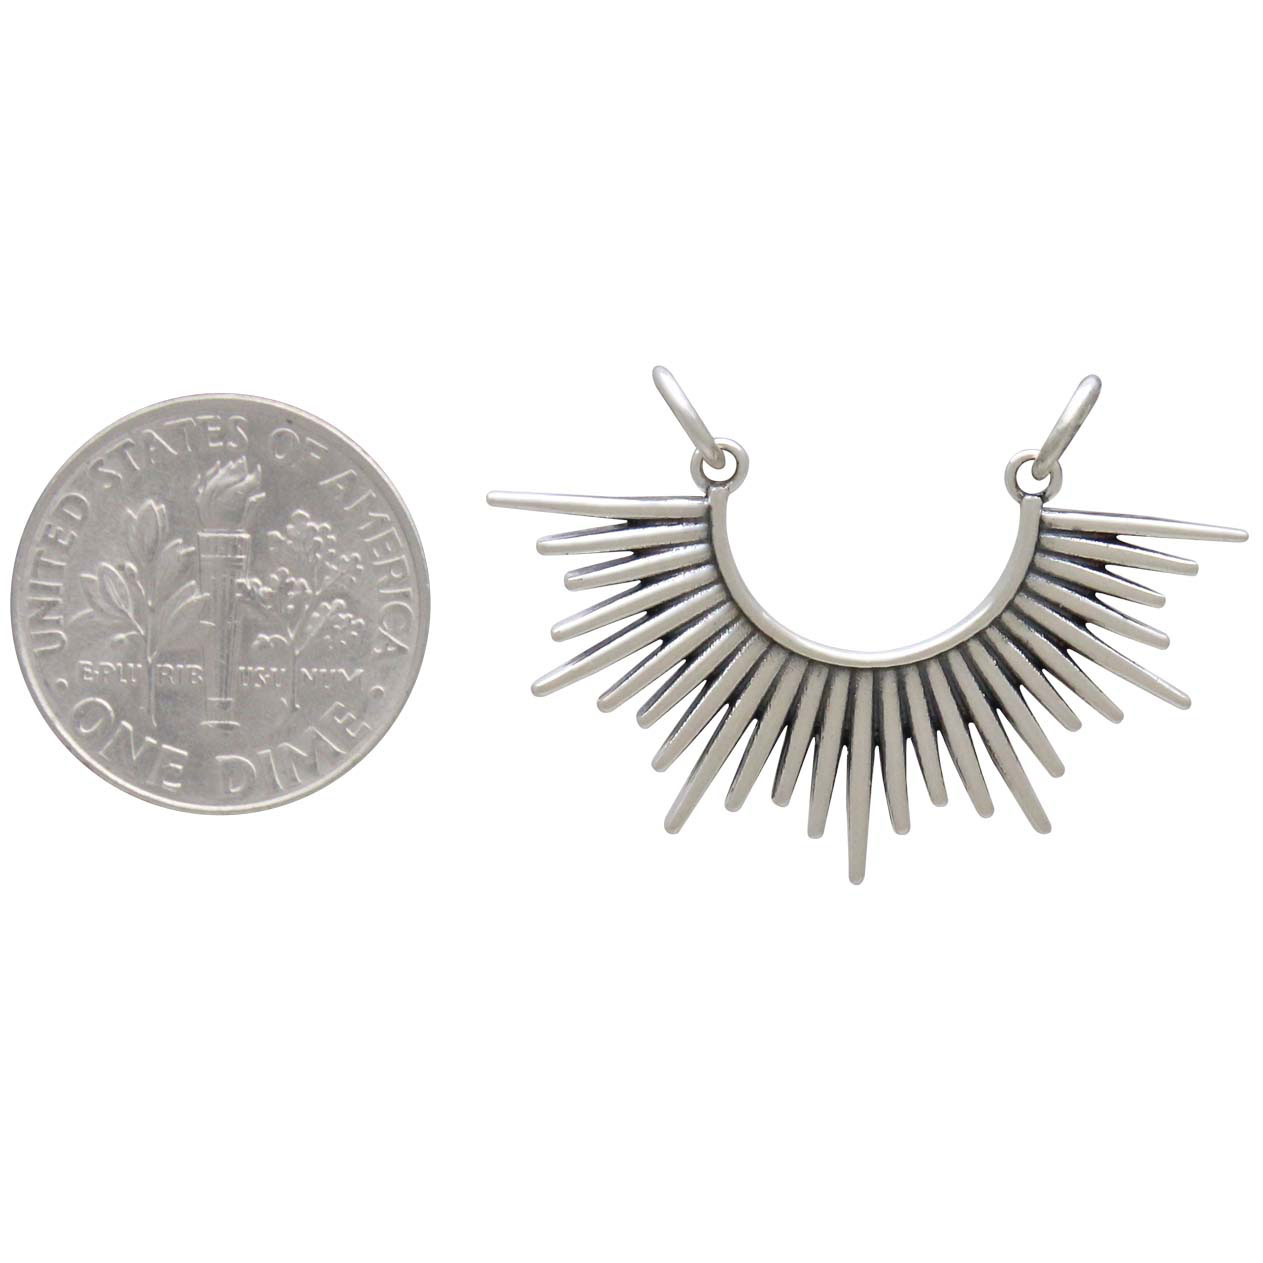 Sterling Silver Sunburst Spike Pendant Festoon 23x32mm